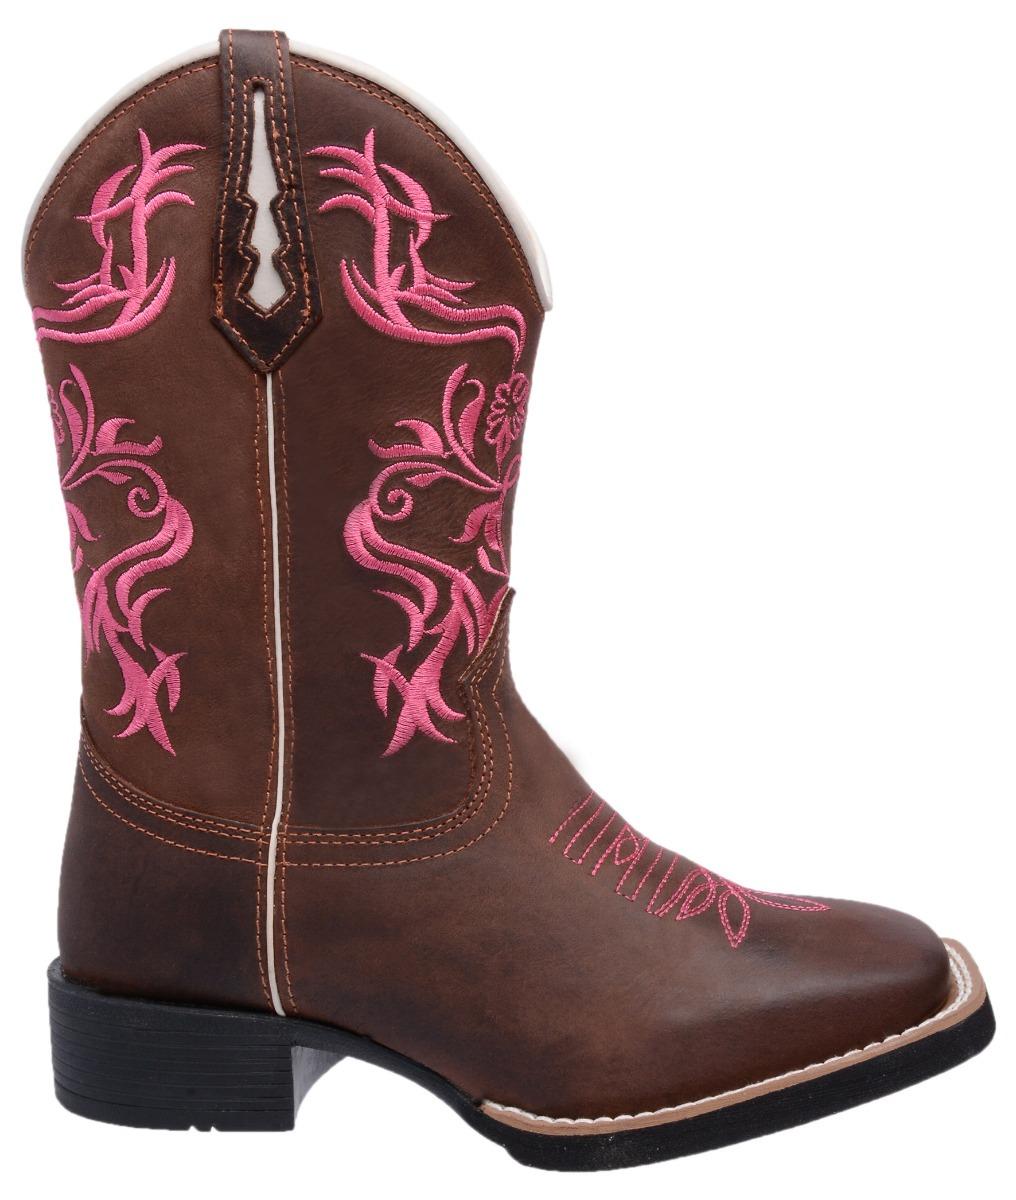 087a2097f7 bota feminina country rodeio texana coturno couro legitimo. Carregando zoom.